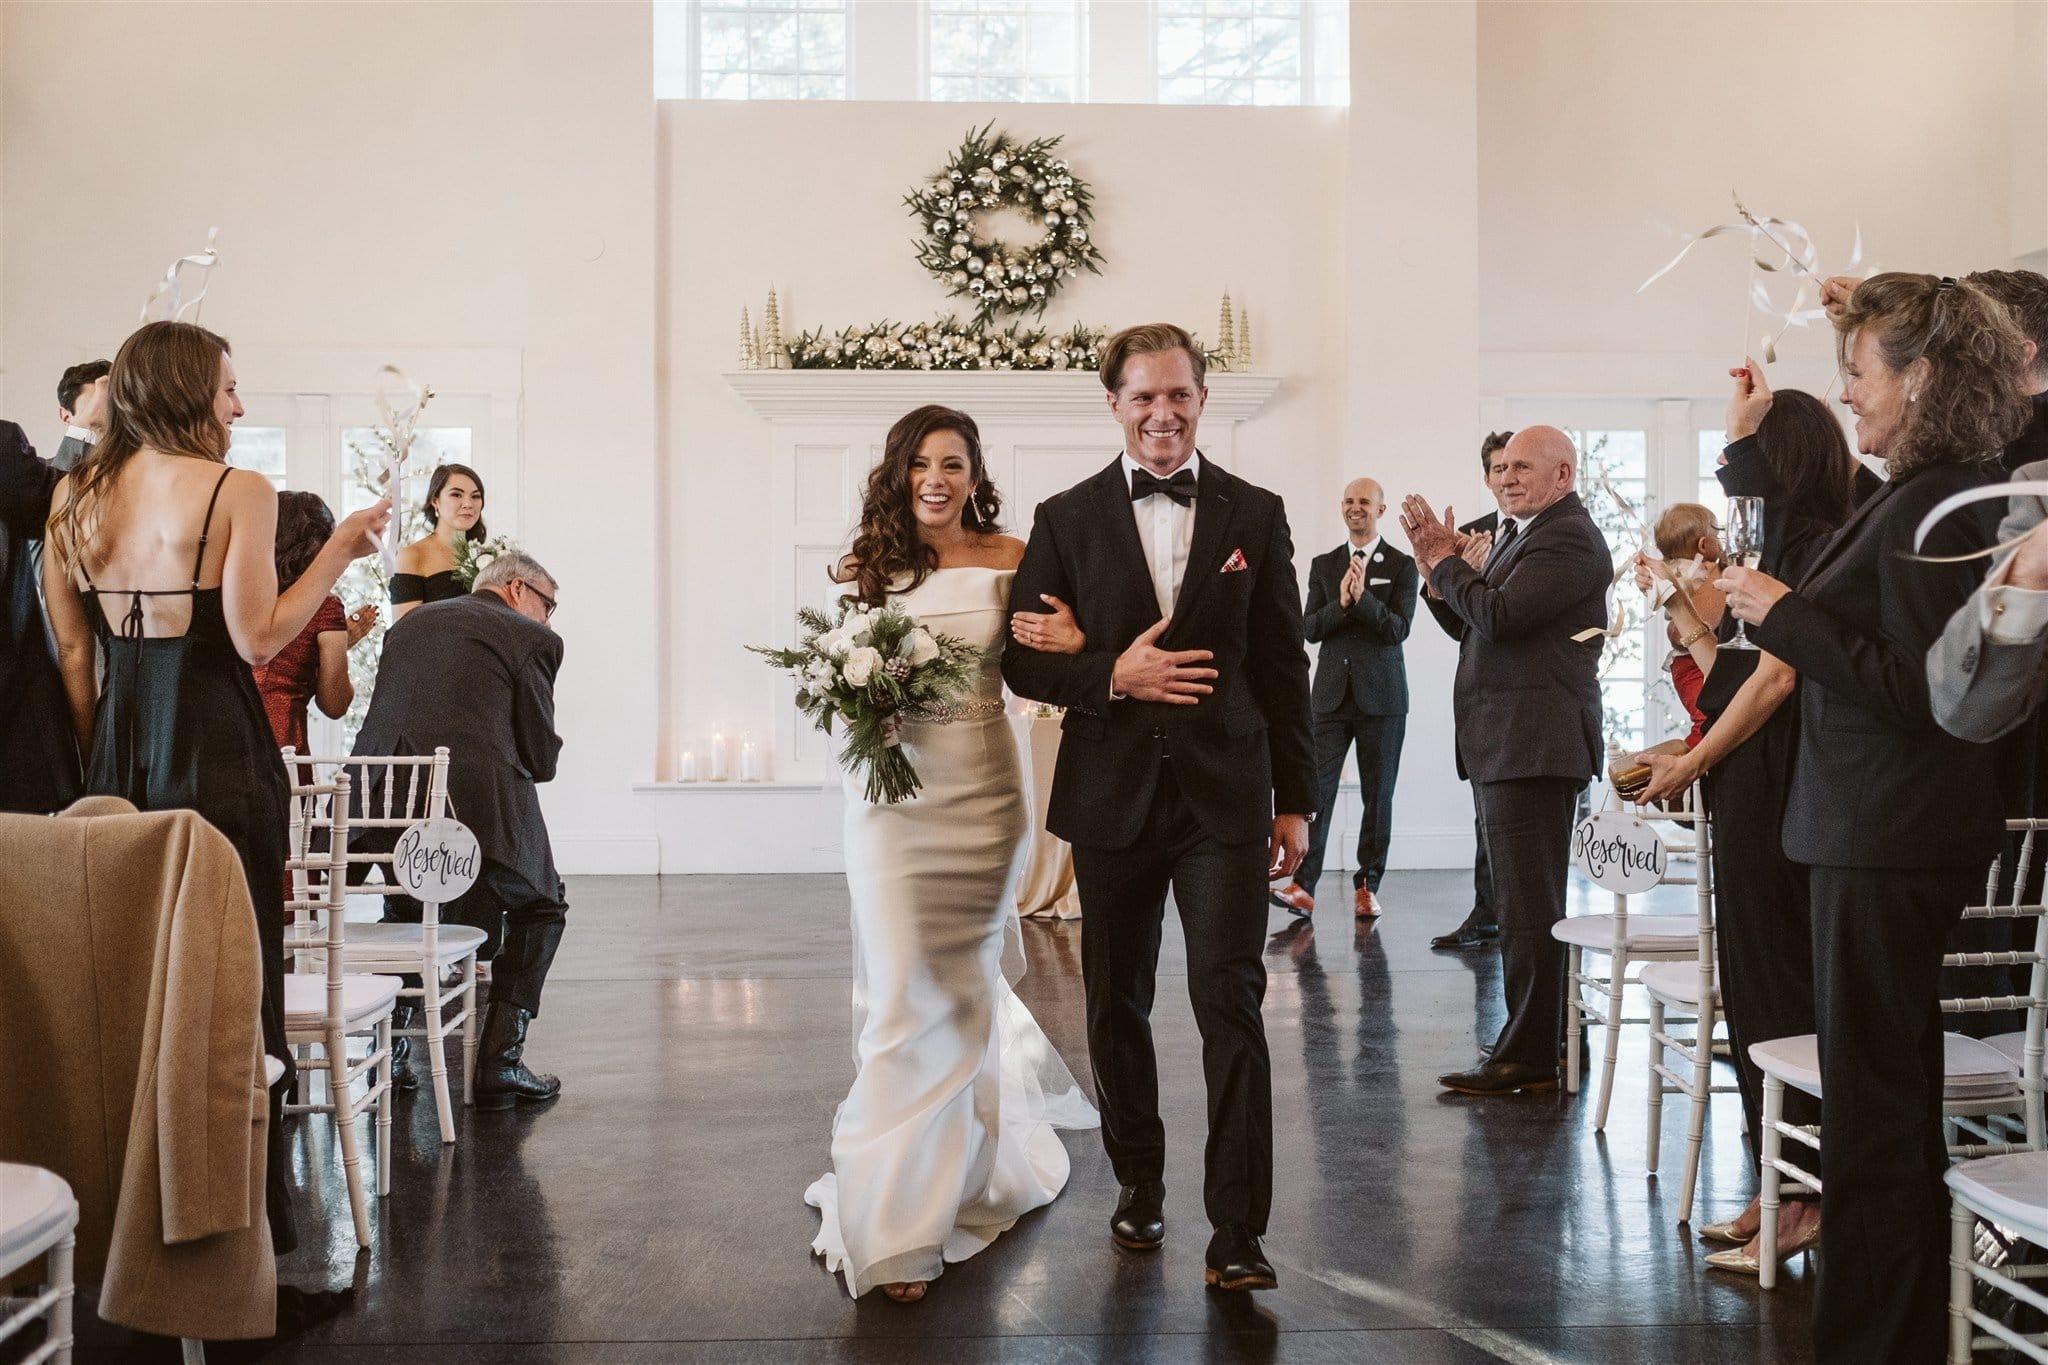 Indoor wedding venue in Denver at The Manor House